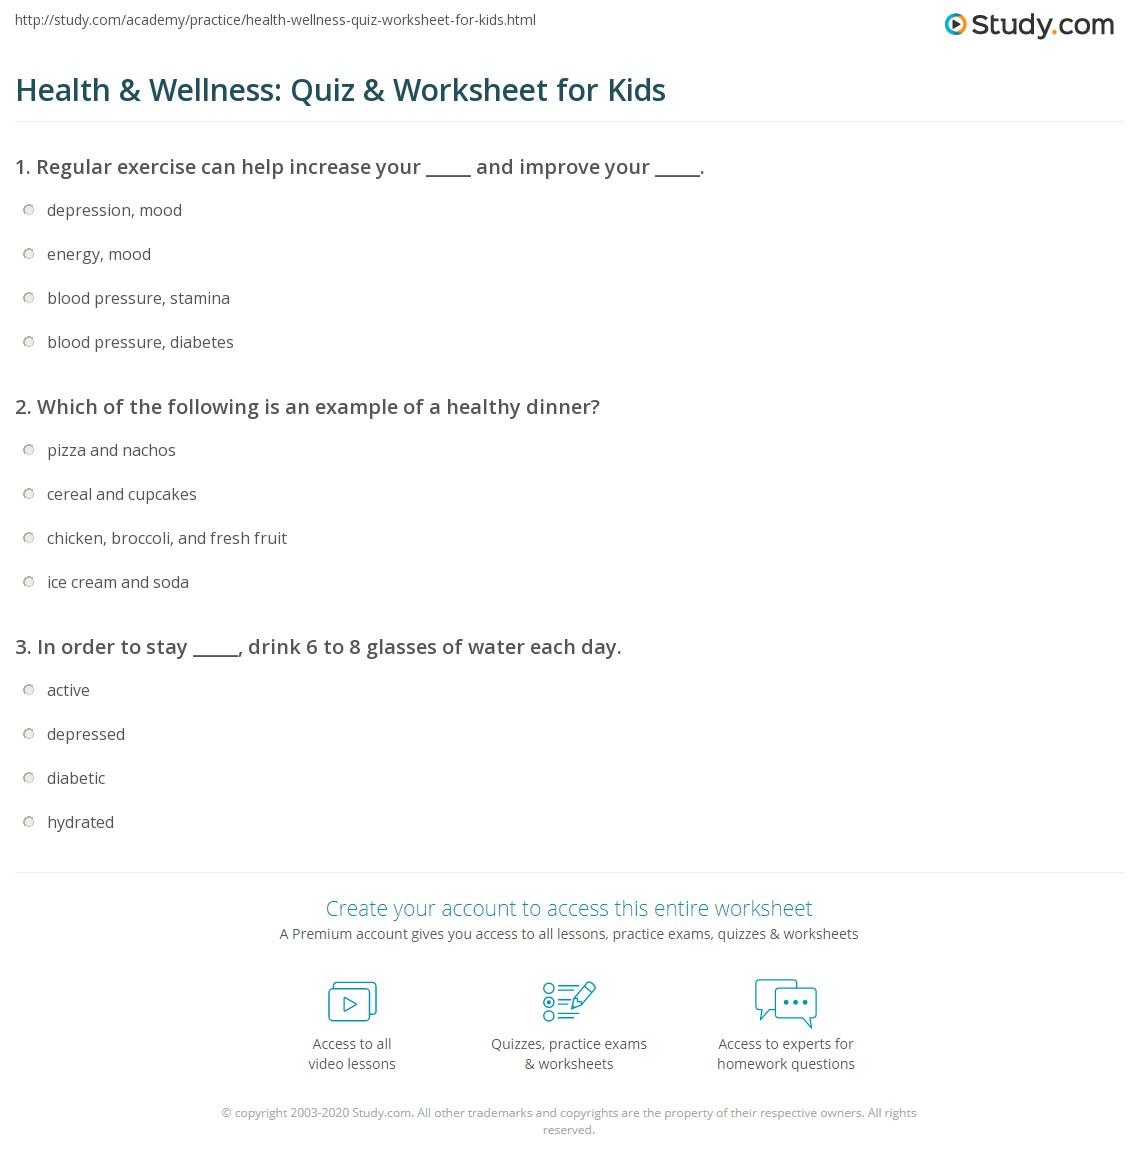 Worksheets Health And Wellness Worksheets health wellness quiz worksheet for kids study com print lesson worksheet